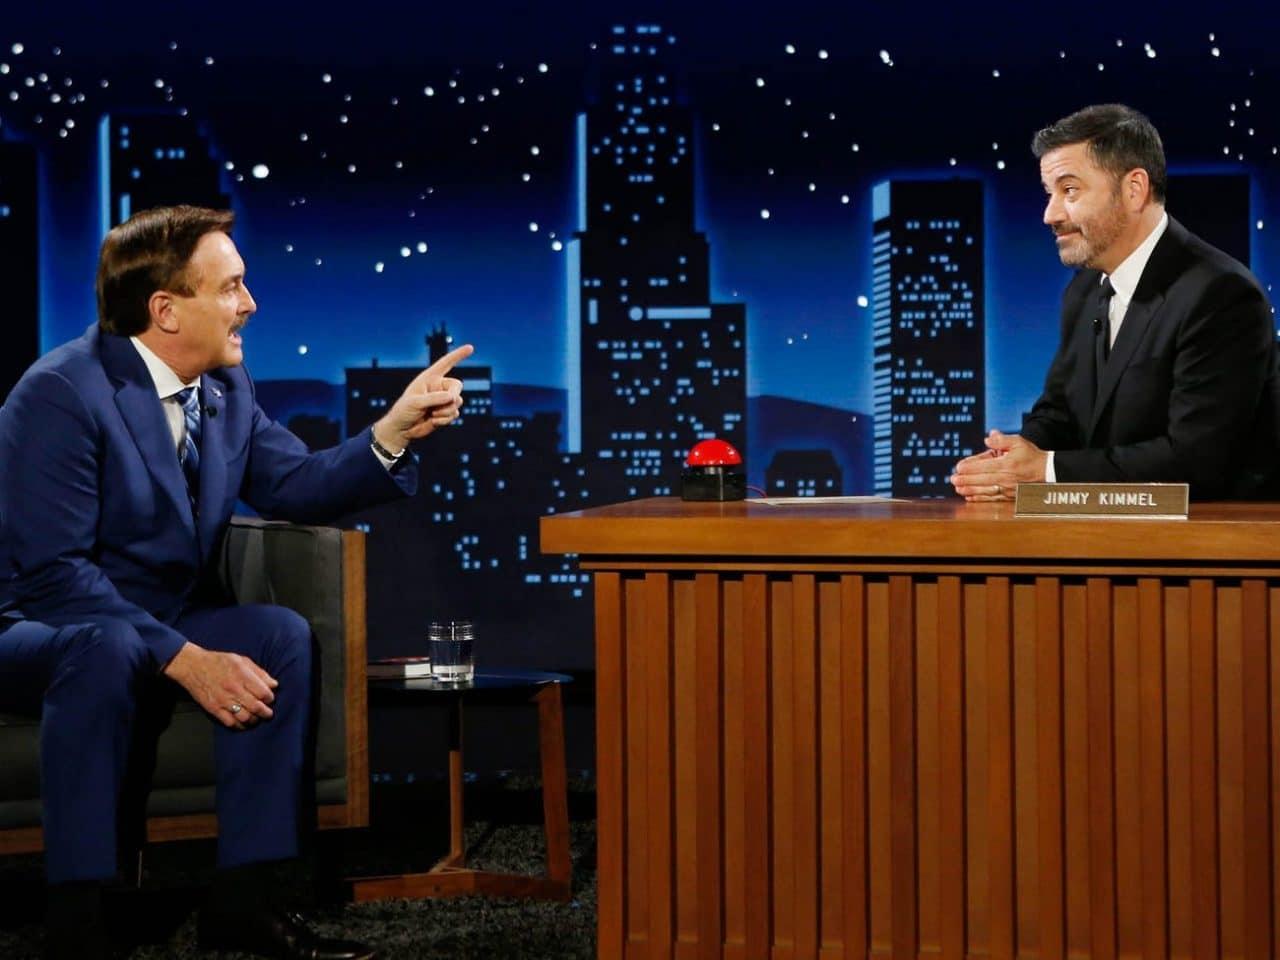 Jimmy Kimmel's Interview with the MyPillow CEO Got Pretty Weird